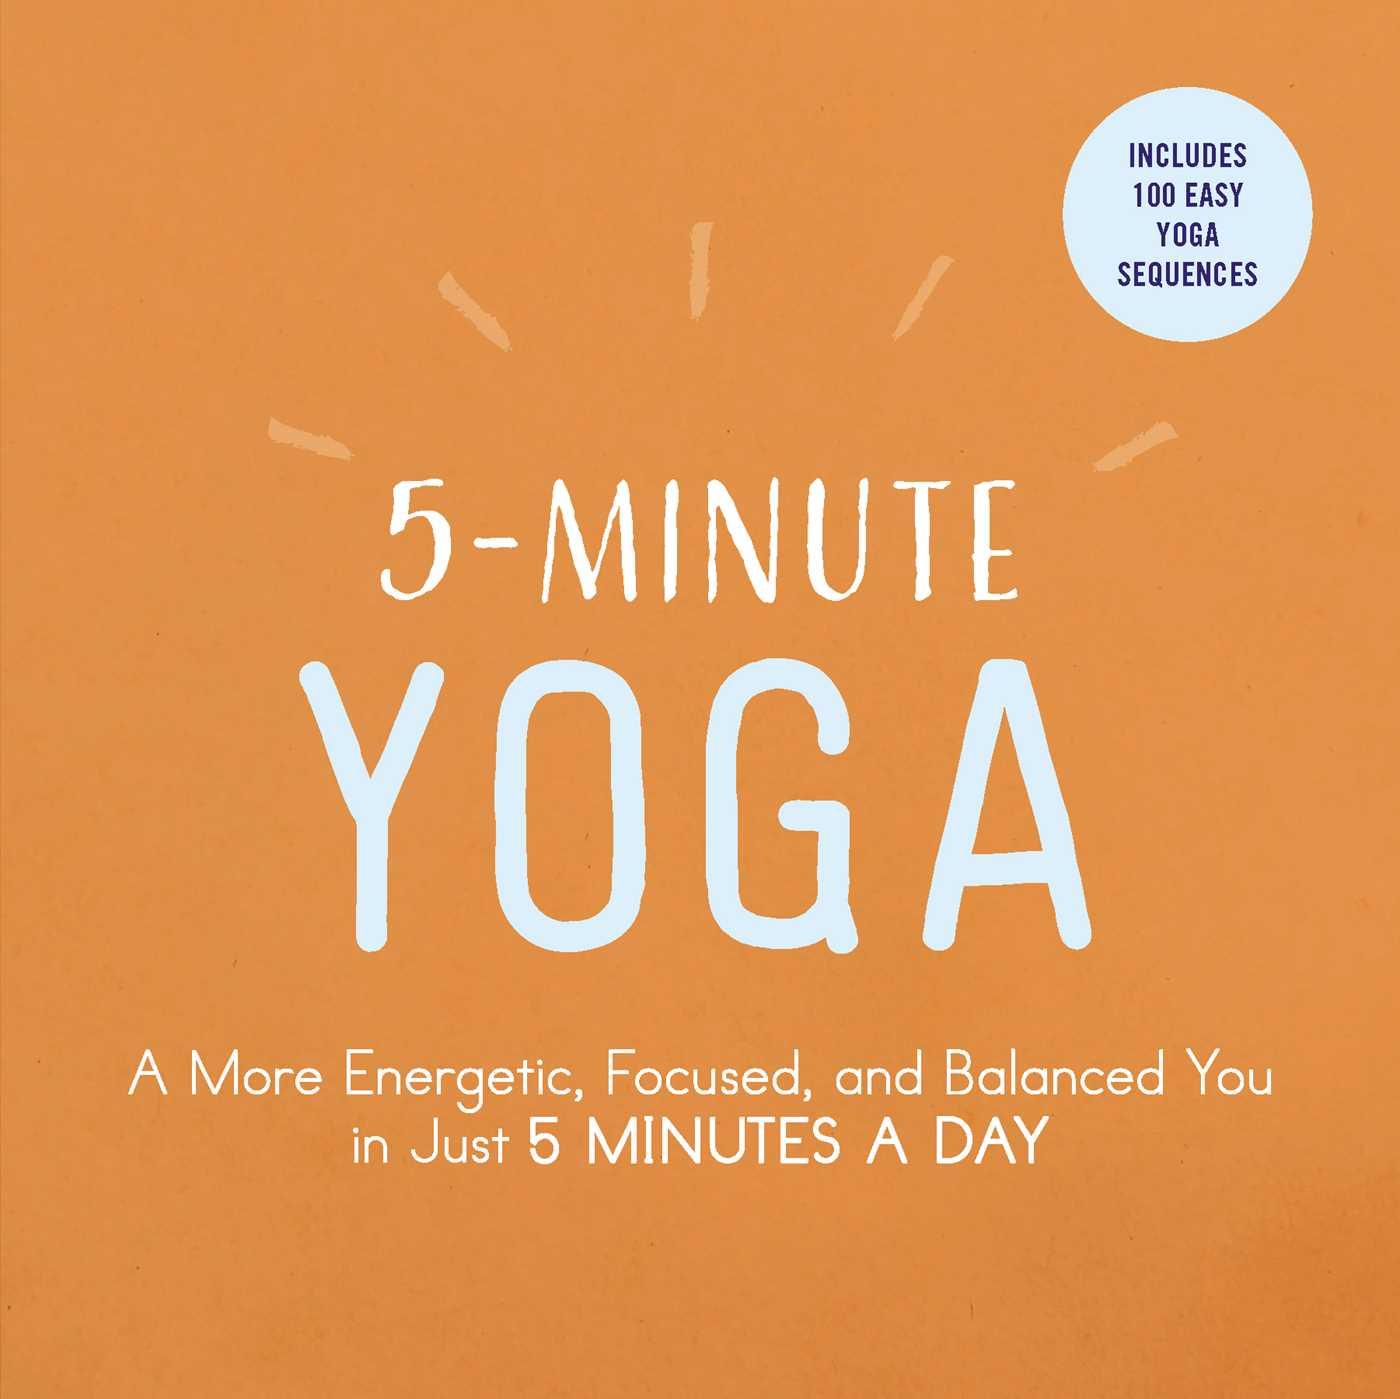 5 minute yoga 9781507206324 hr